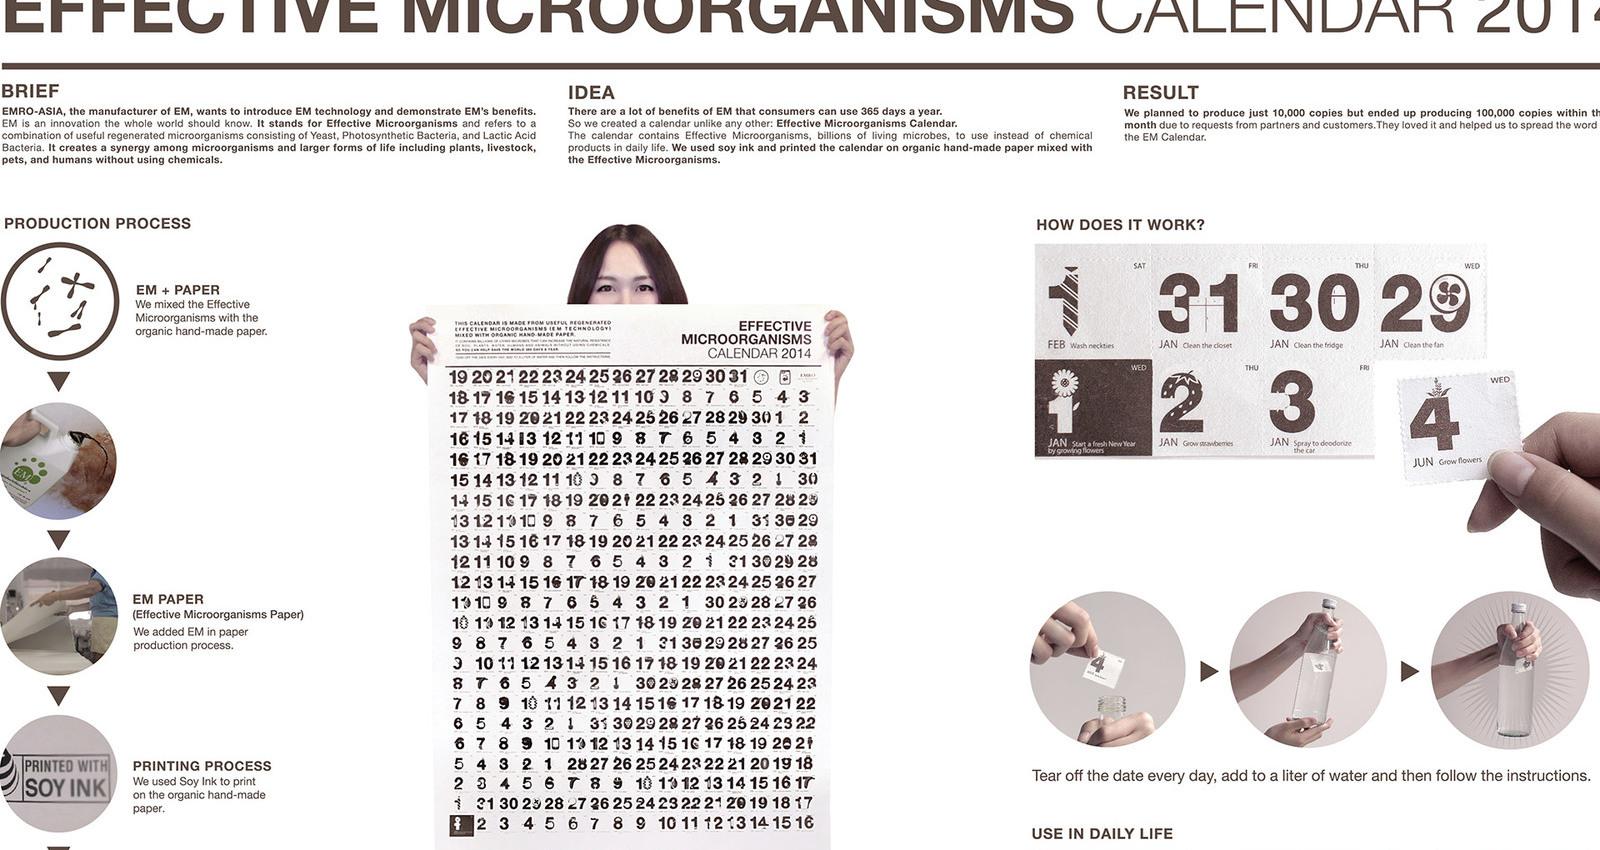 EFFECTIVE MICROORGANISMS CALENDAR